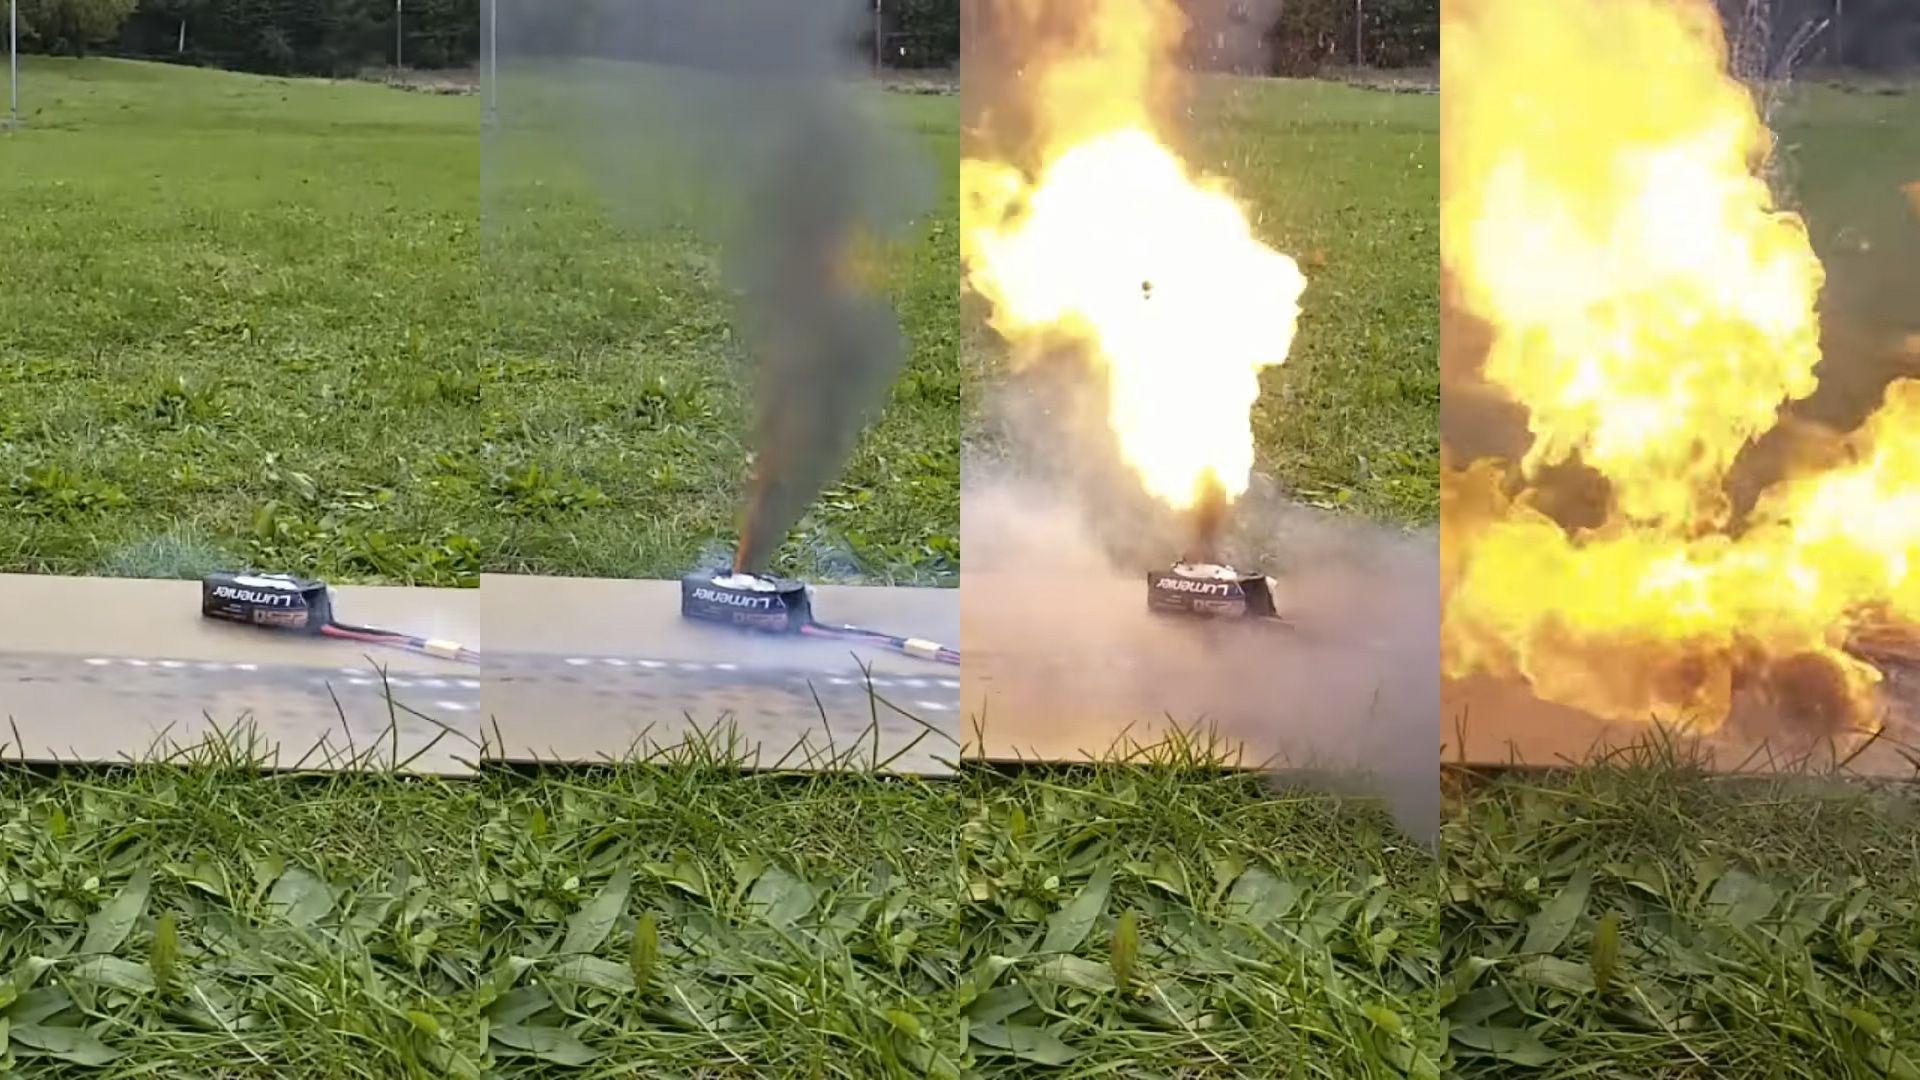 lipo_explosion-1.jpg.optimal